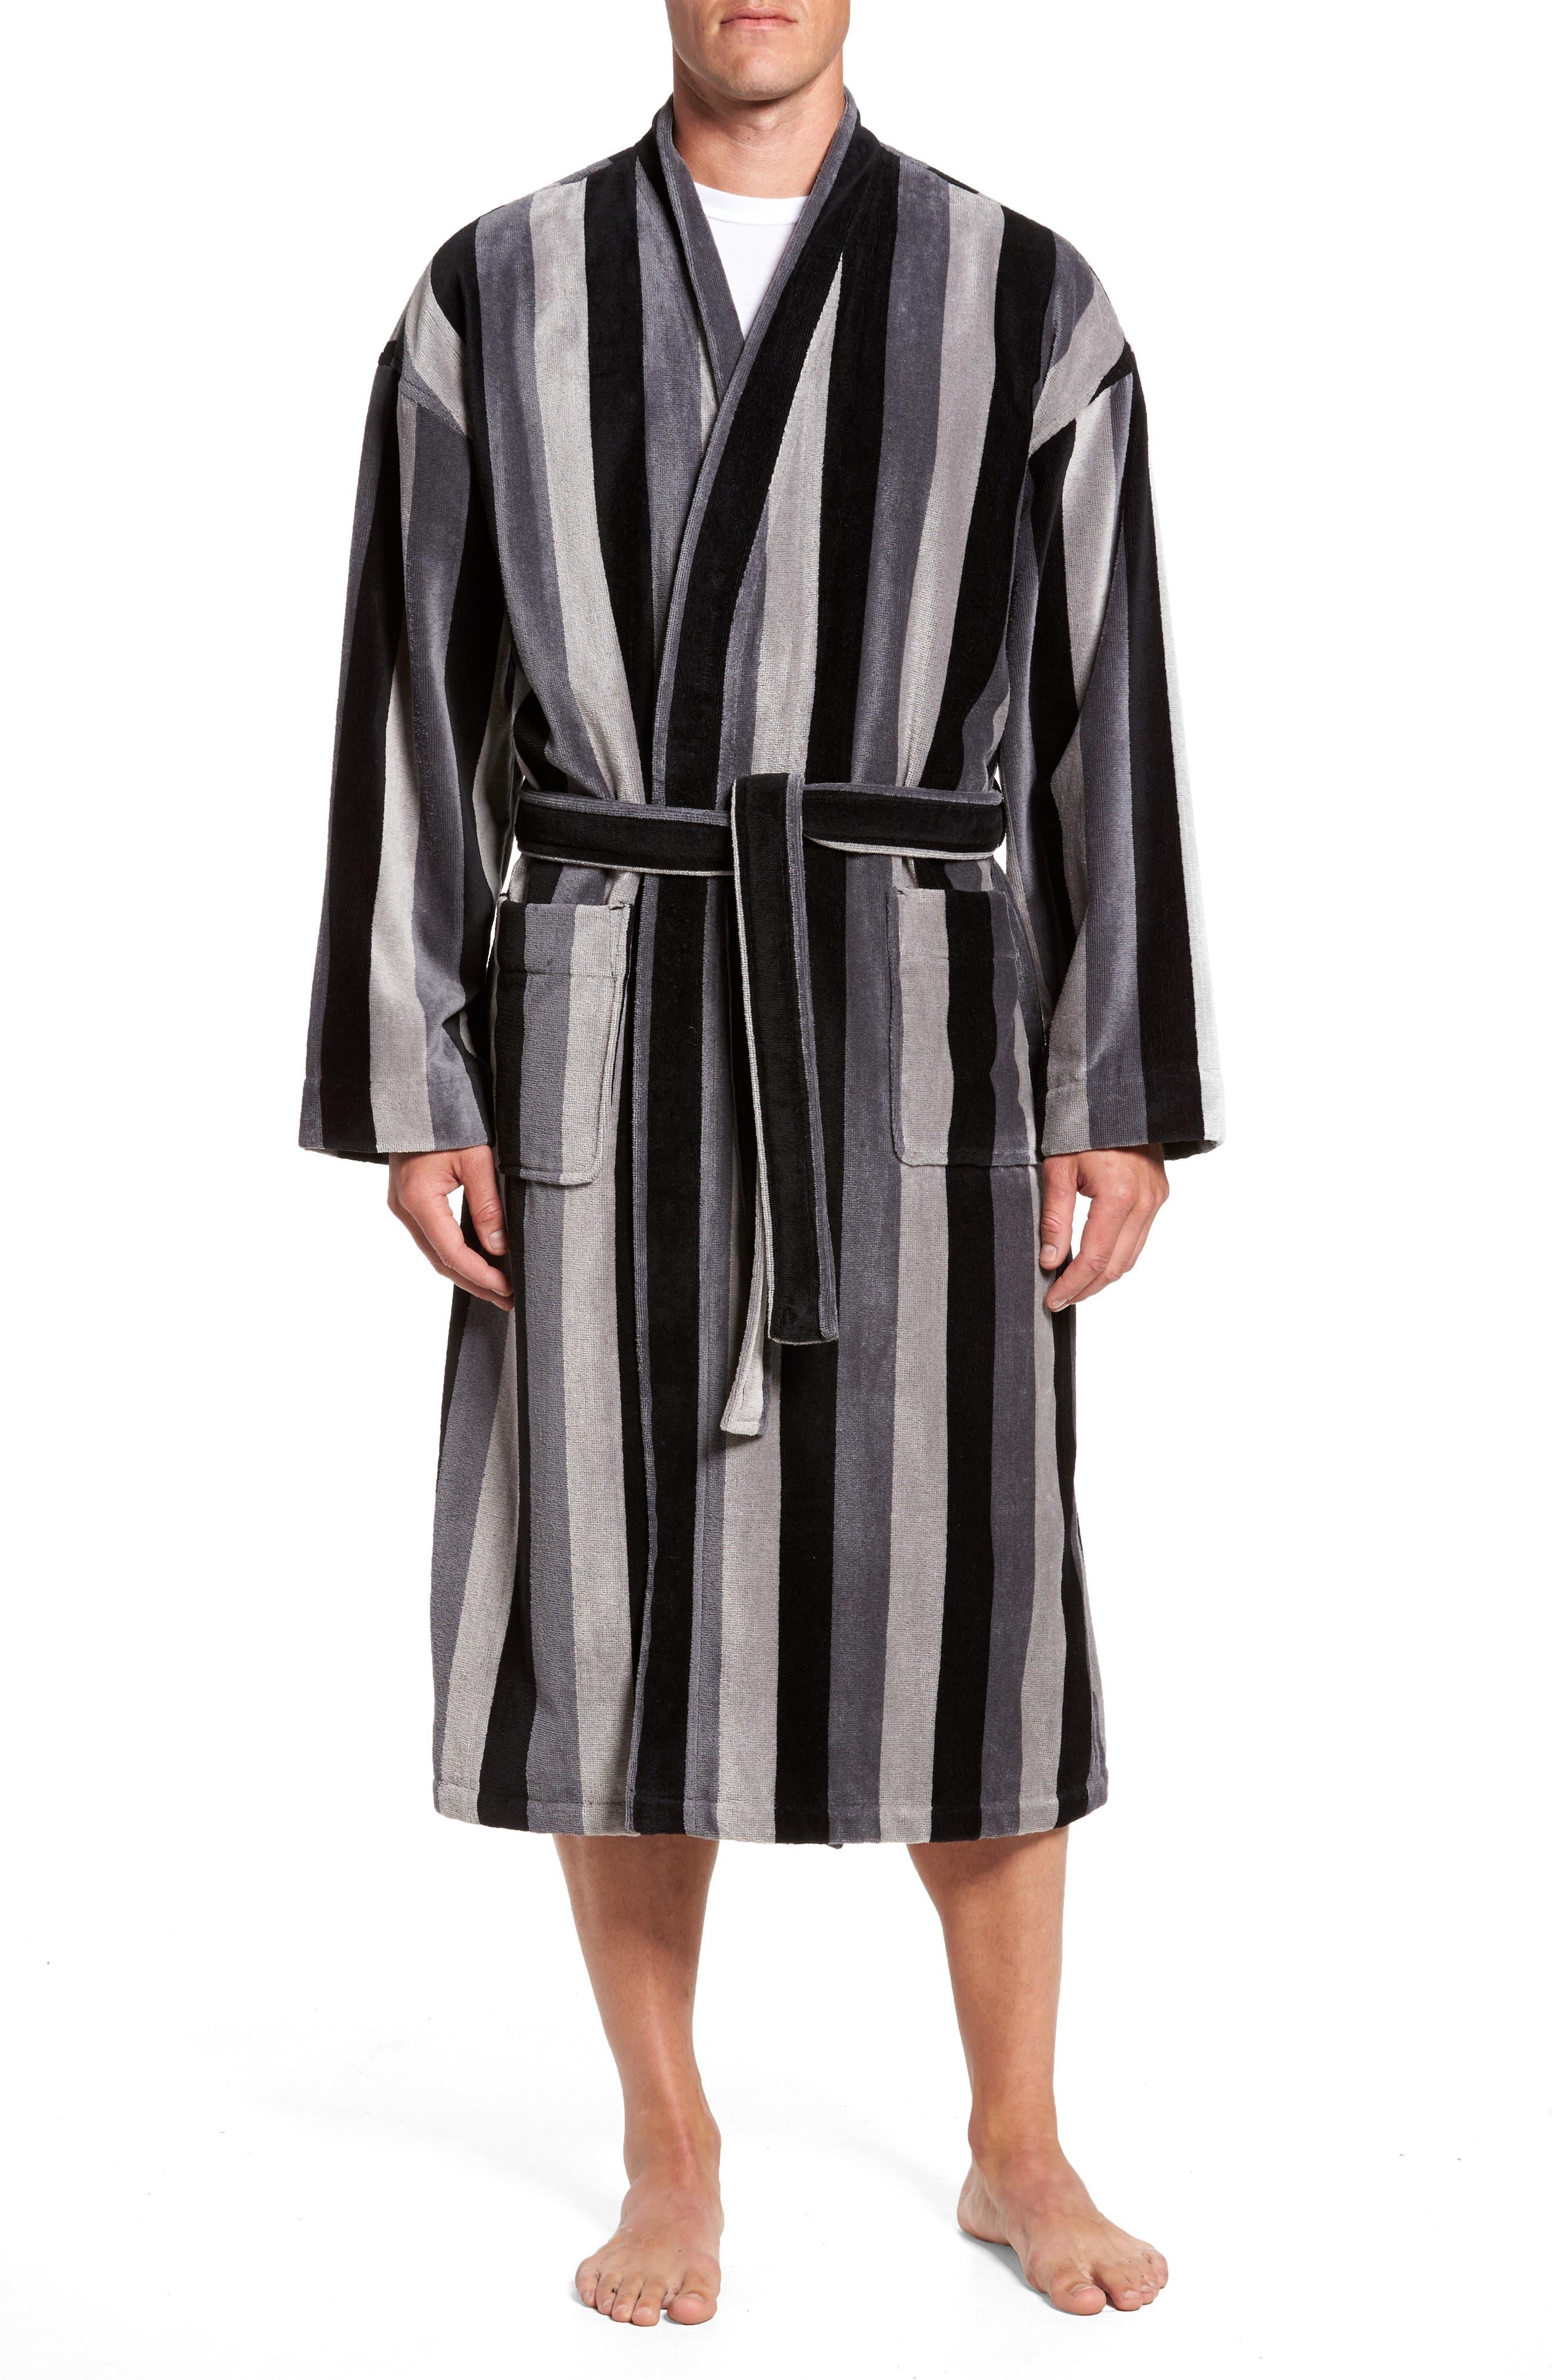 Remarkavelour Robe,                             Main thumbnail 1, color,                             001